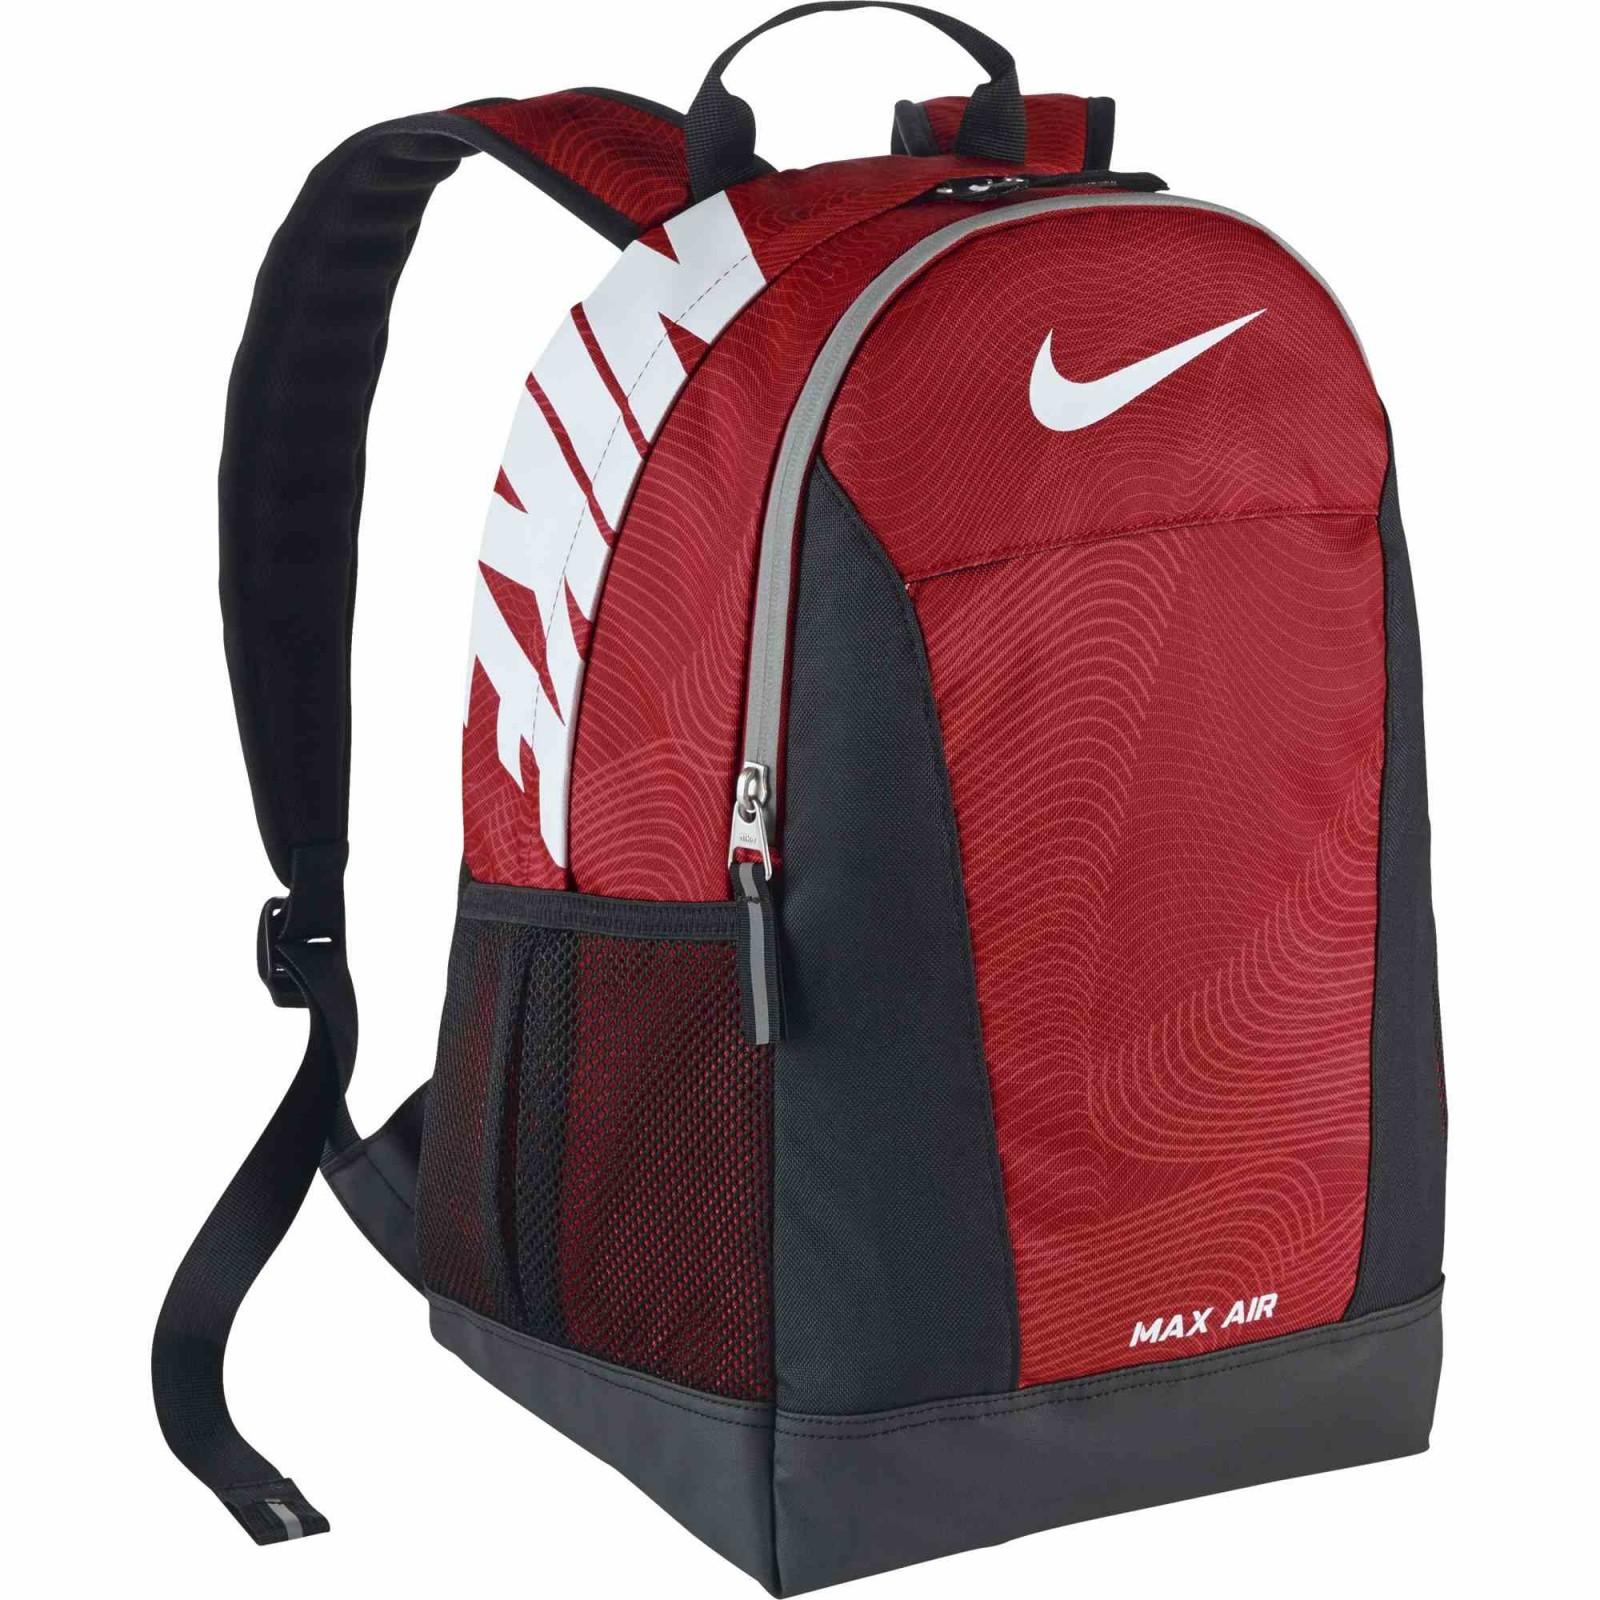 7ba1a26fd5b Dětský batoh Nike YA MAX AIR TT SM BACKPACK